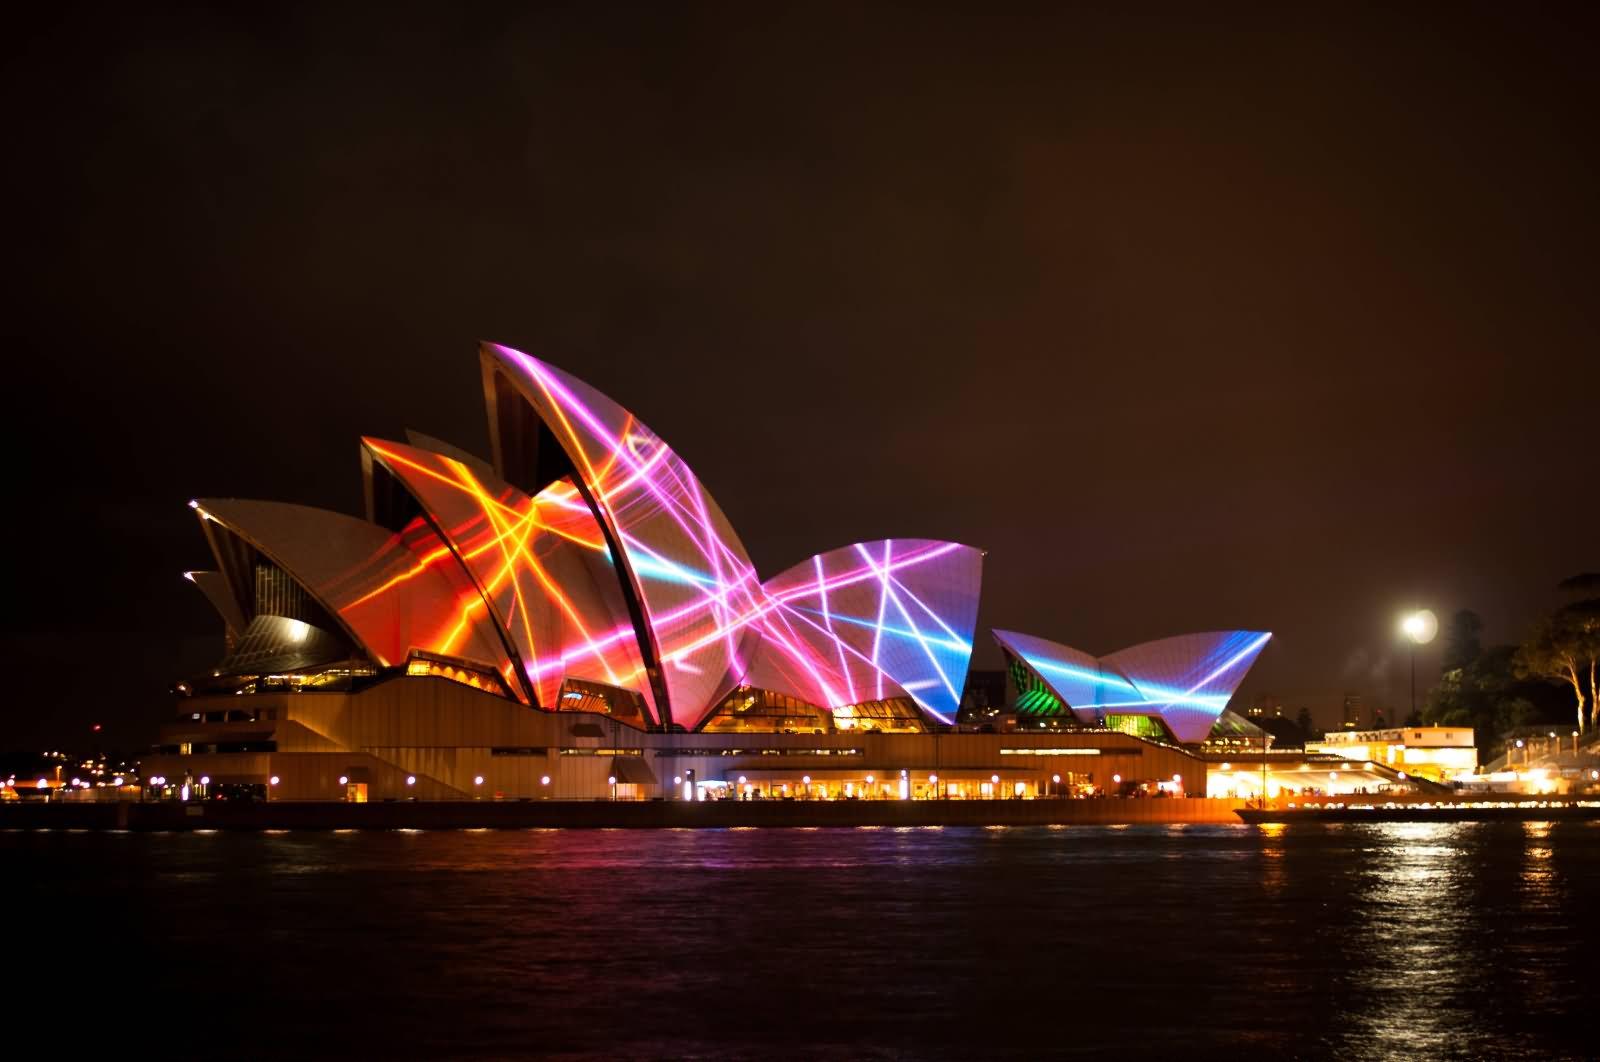 Sydney Opera House Night View For Vivid Festival - 44+ Pictures Of Sydney Opera House At Night  PNG